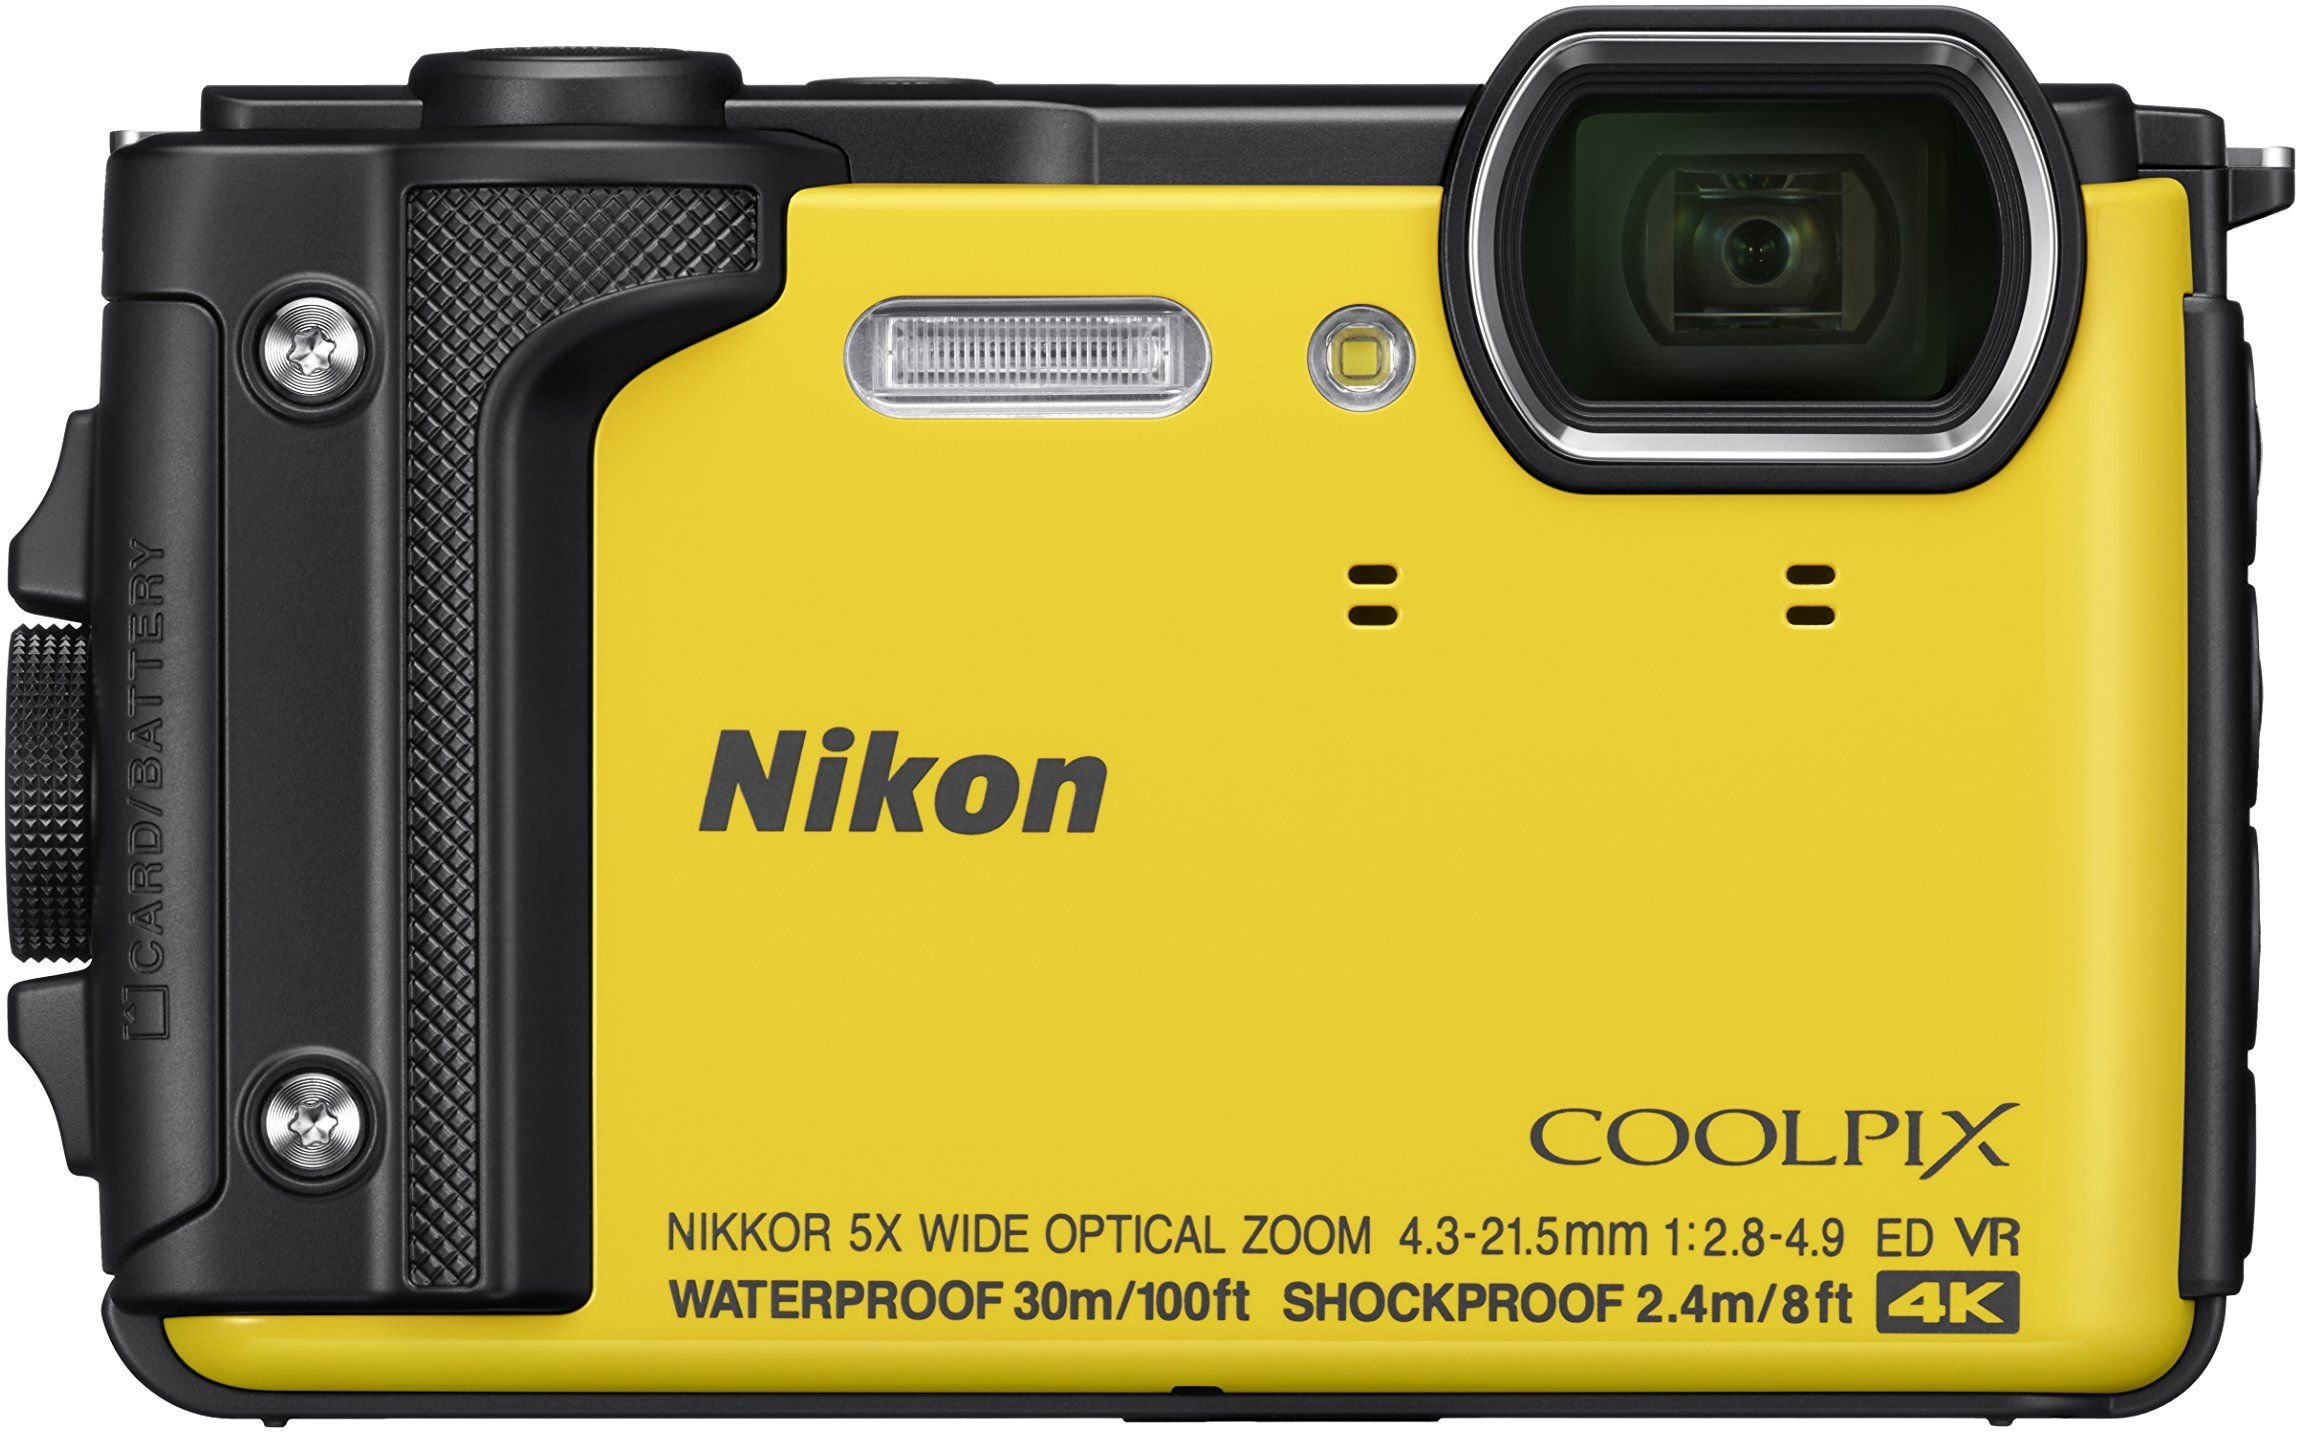 Nikon W300 Waterproof Underwater Digital Camera with TFT LCD, 3'', Yellow (26525) by Nikon